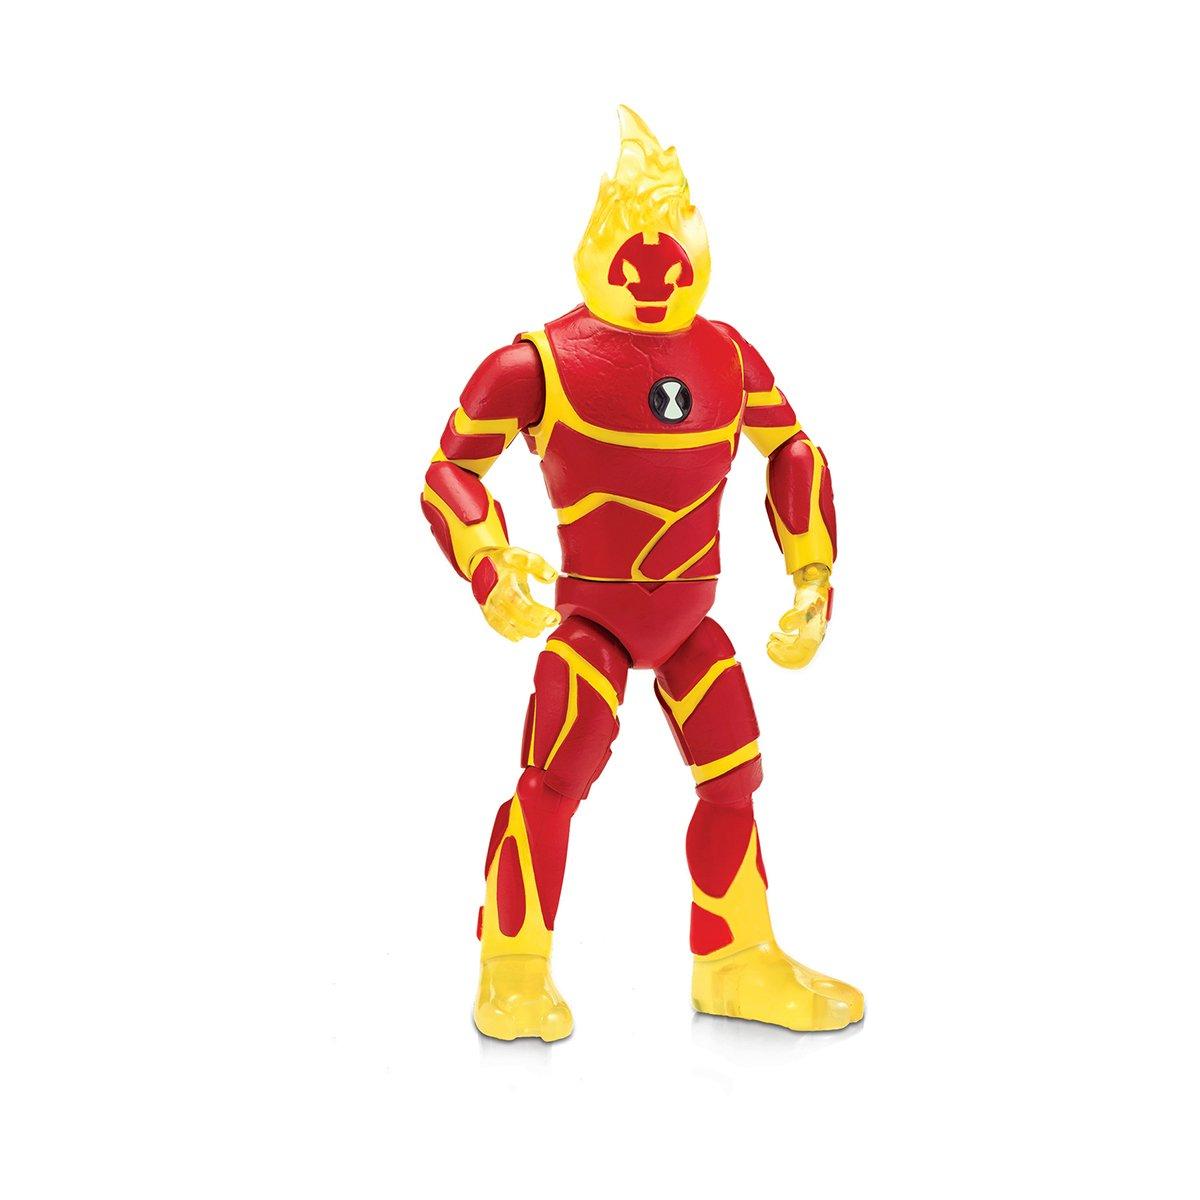 Figurina Ben 10 Giant - Heatblast (76651)